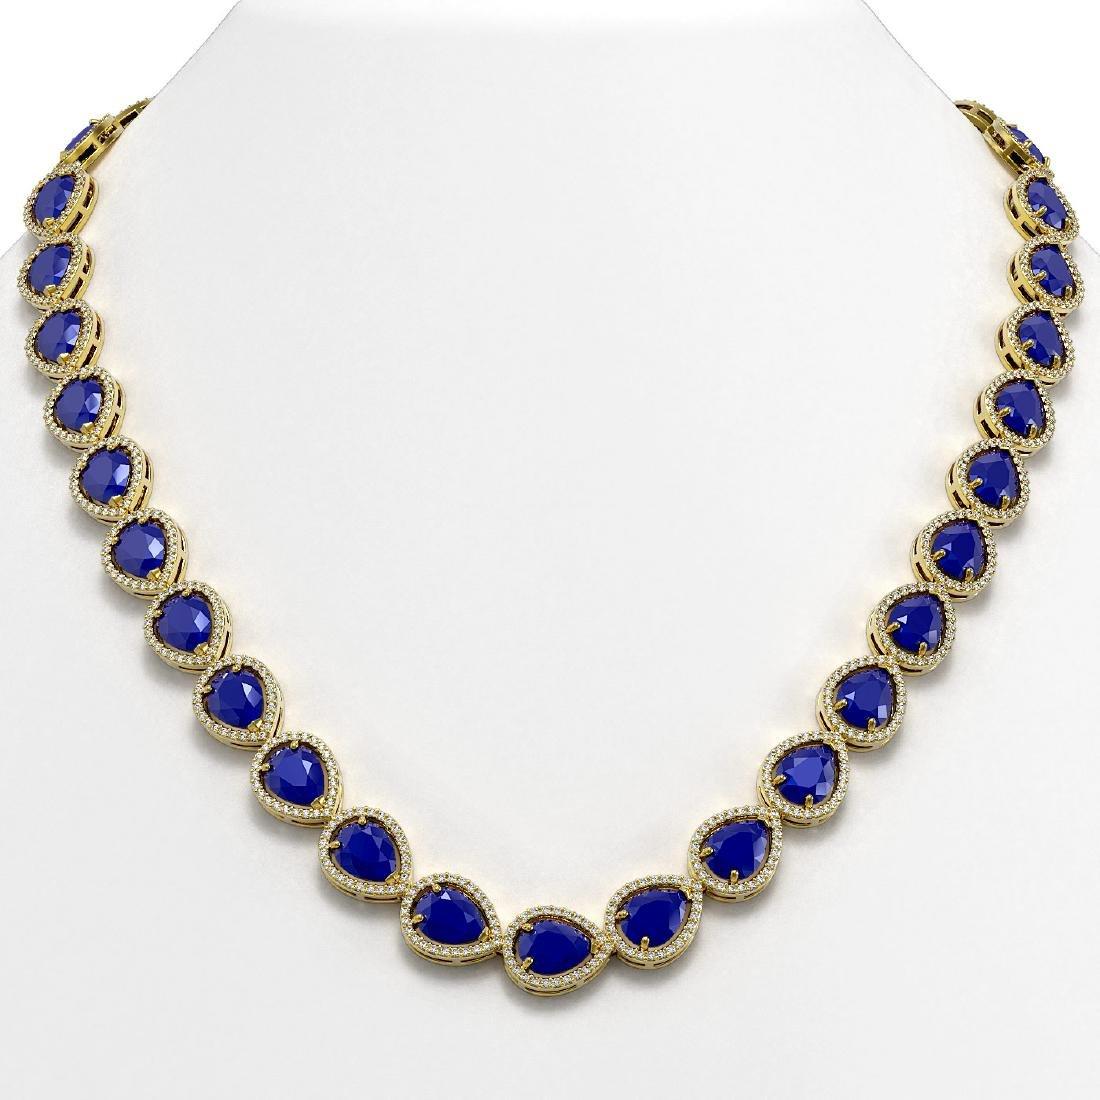 64.01 CTW Sapphire & Diamond Halo Necklace 10K Yellow